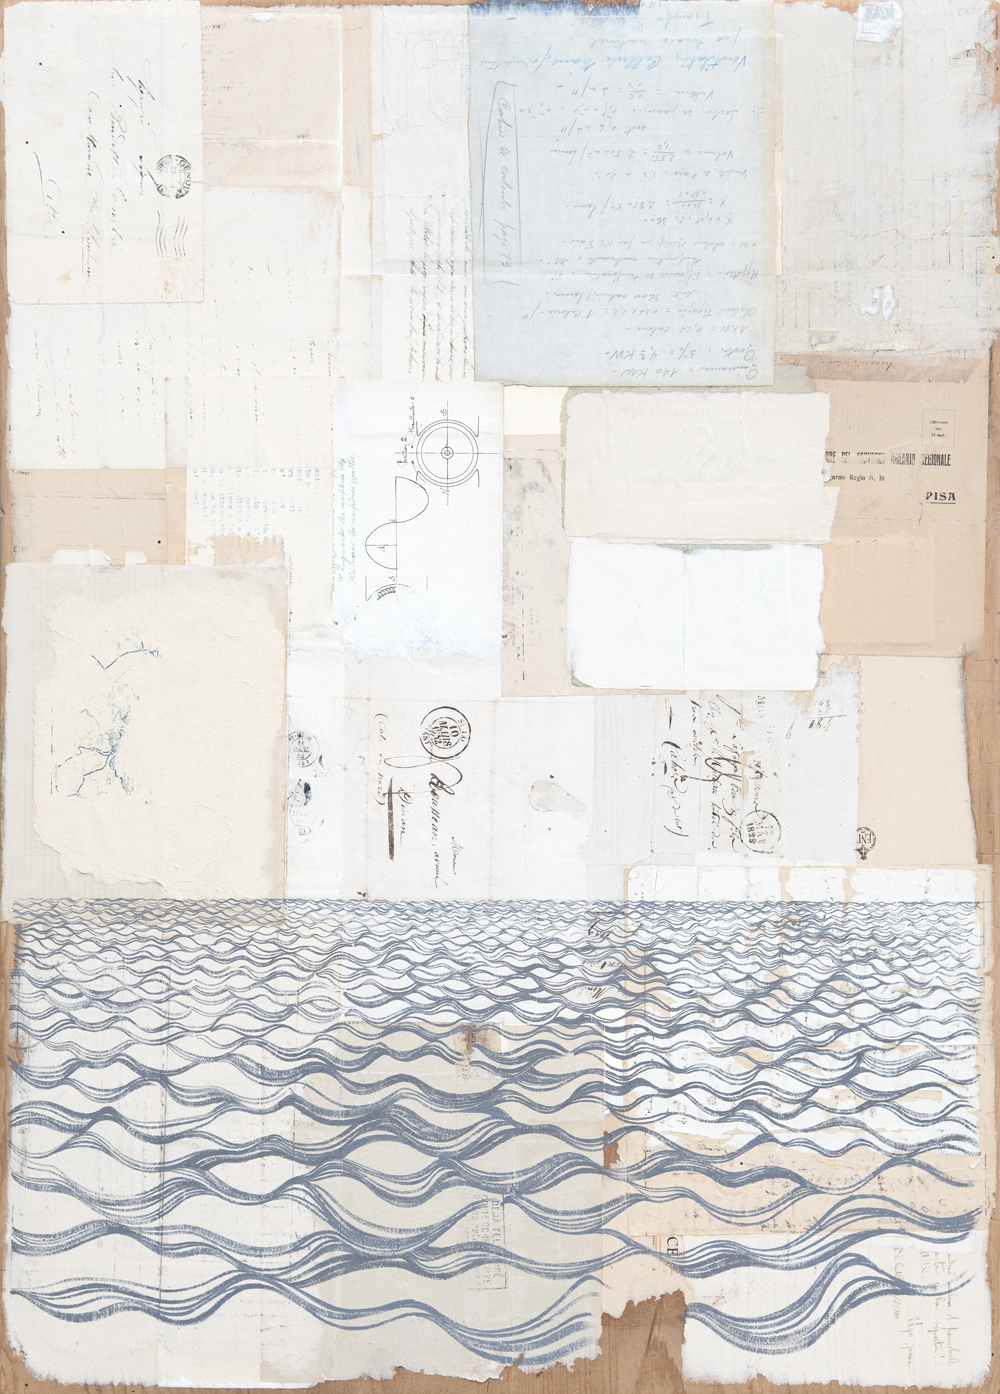 Der Gehele Aarde III  2015 · 59 x 81 cm · Gouache + ancient letters, envelopes, telegrams and ephemera (on drawing board)